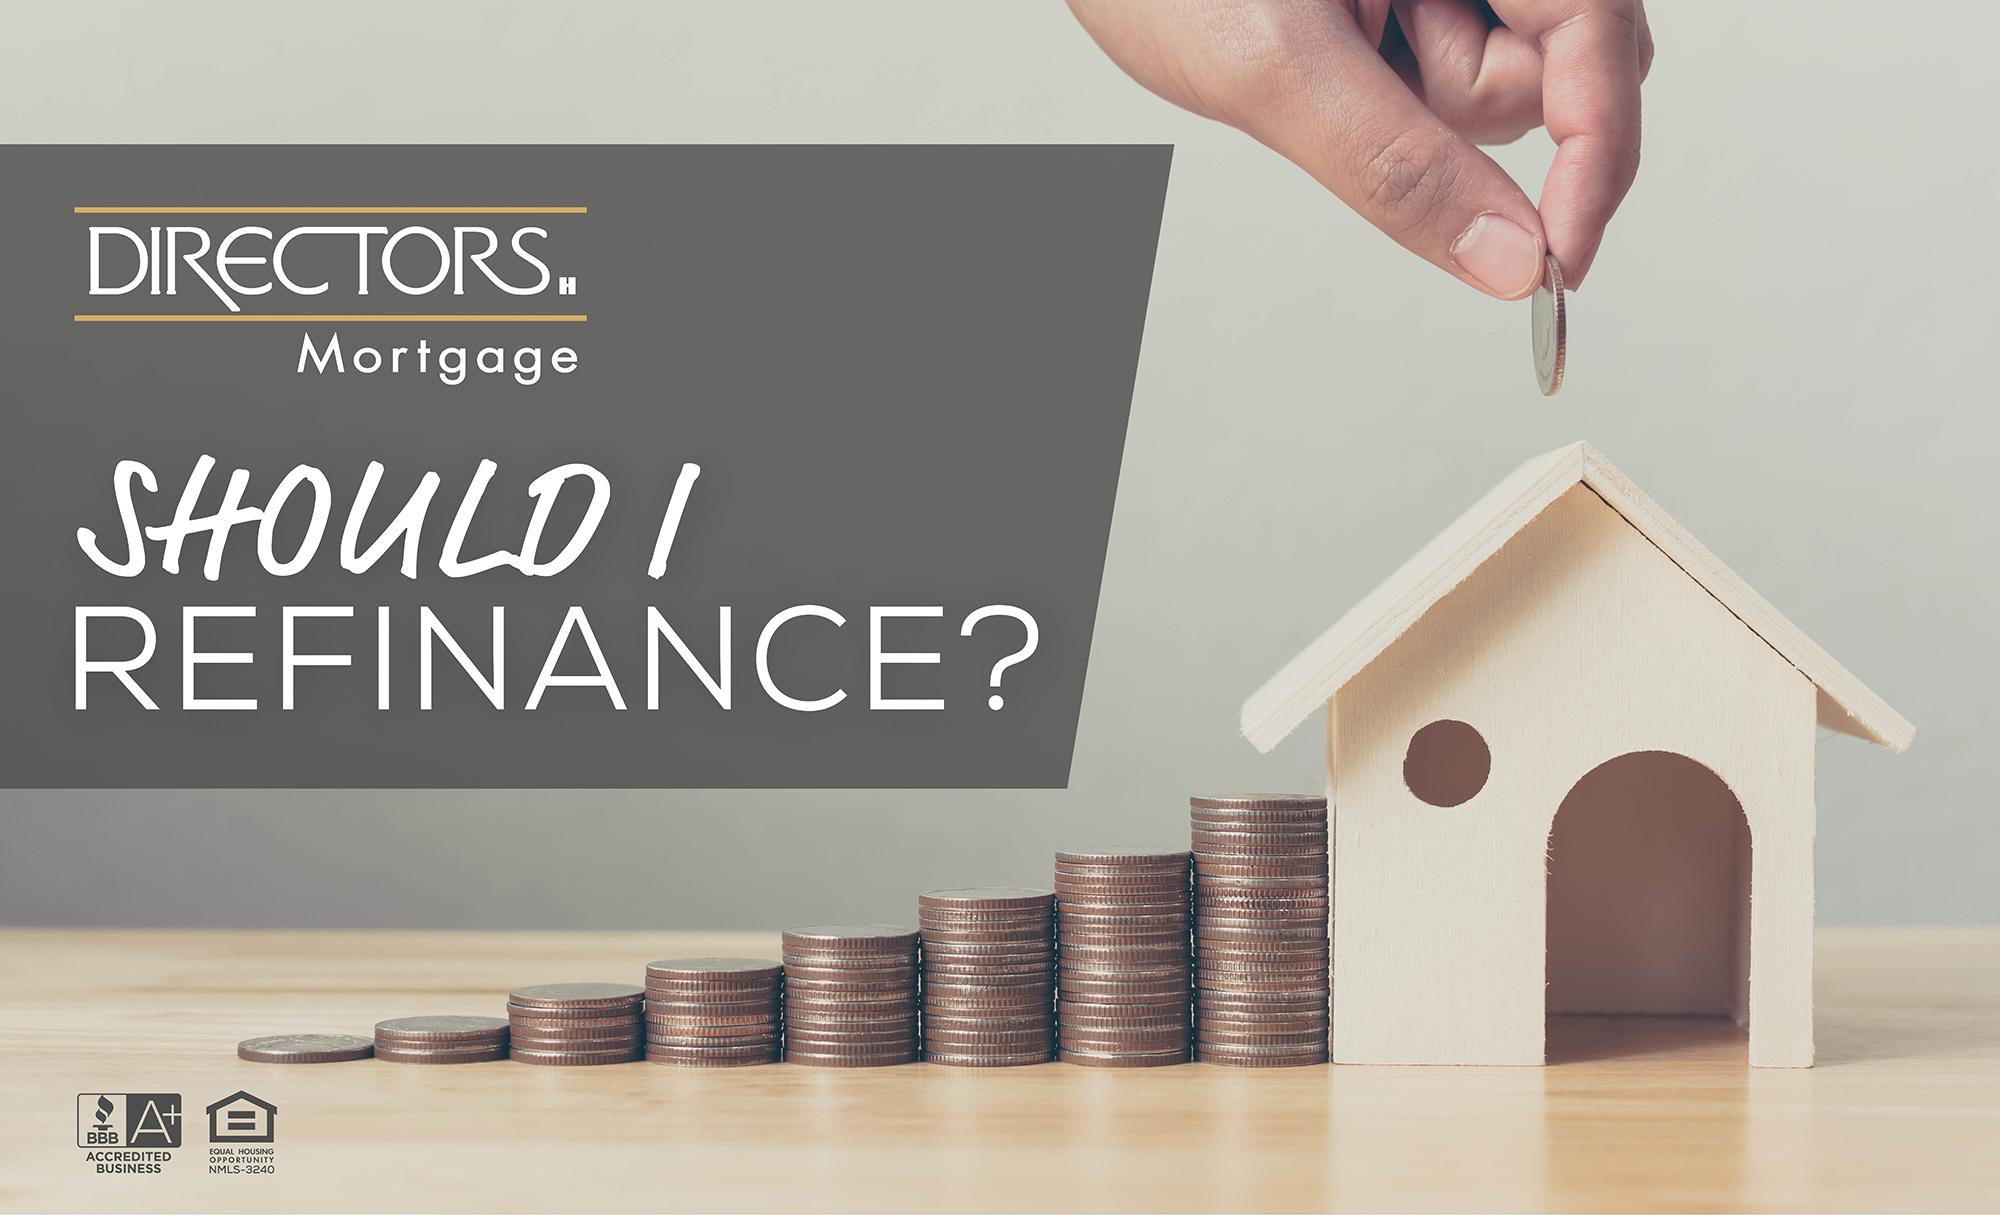 Should_I_Refinance-02 (1).jpg